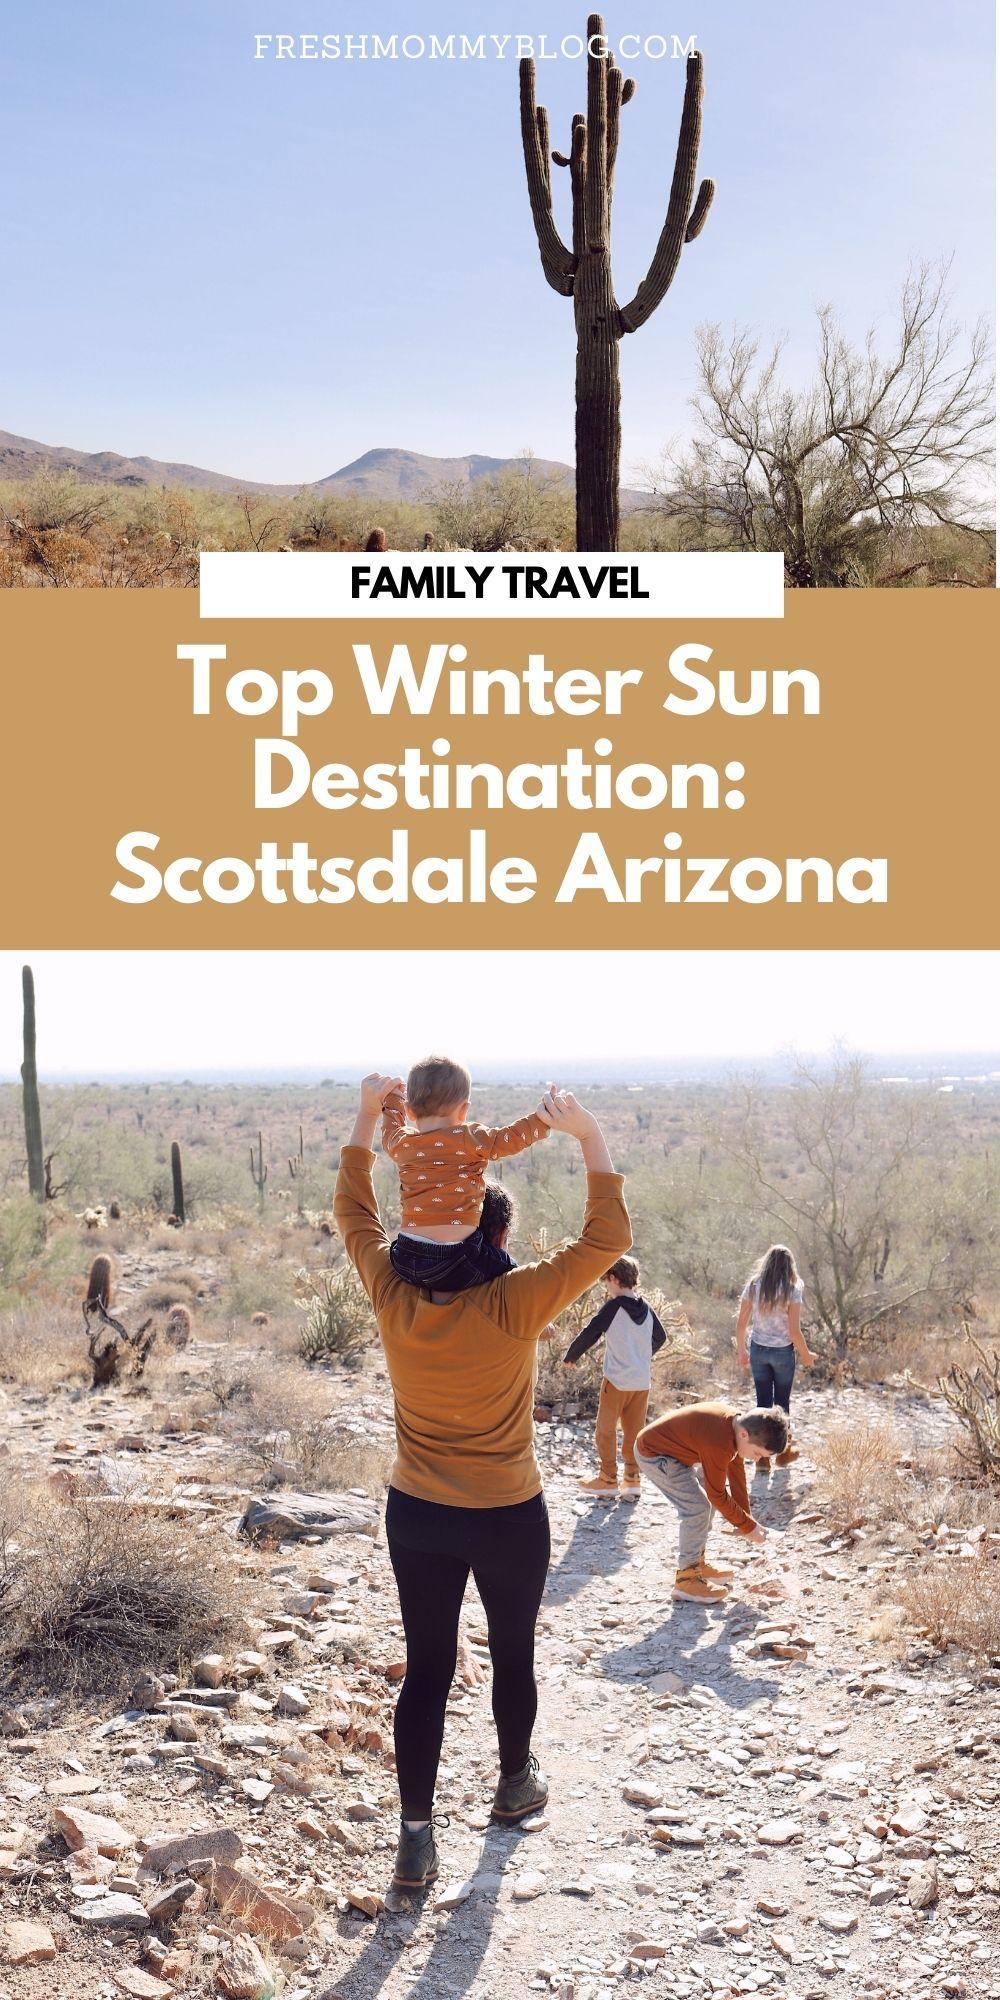 One of the Best Secret Winter Sun Destinations, Scottsdale Arizona. | Scottsdale AZ Travel Guide by popular Florida travel blog, Fresh Mommy Blog: Pinterest image of a family in Scottsdale AZ.